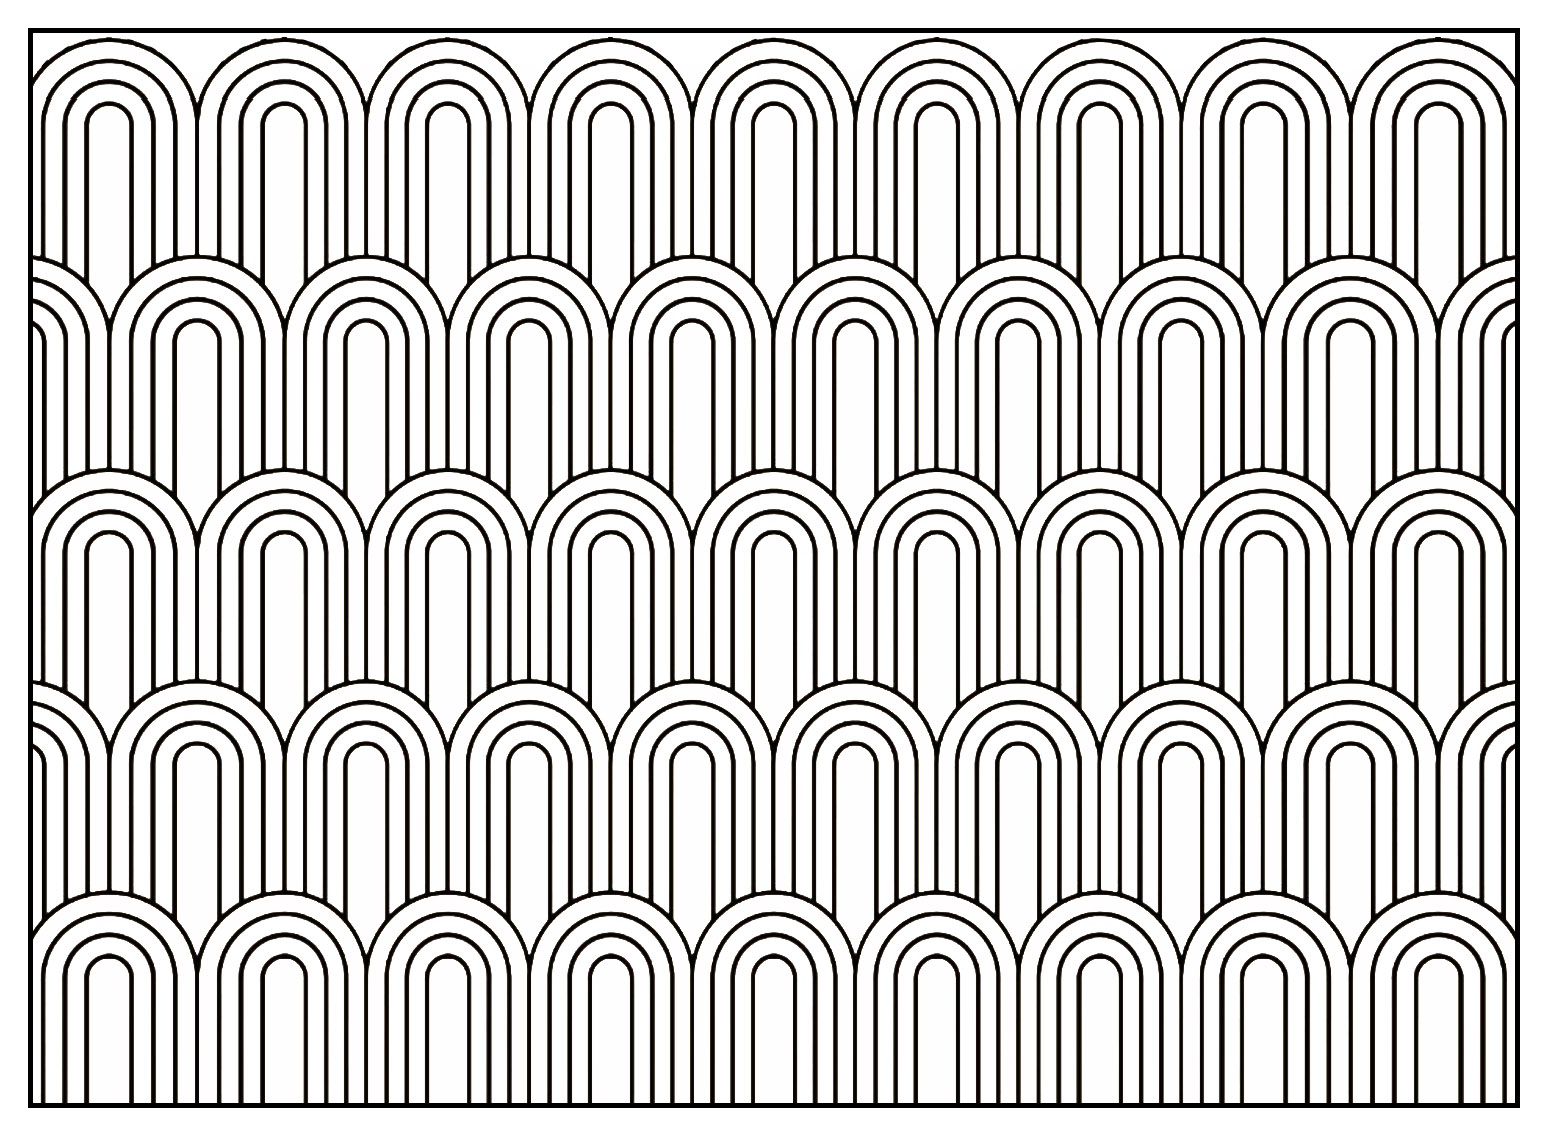 Geometric Patterns Art Deco 7 Art Deco Adult Coloring Pages